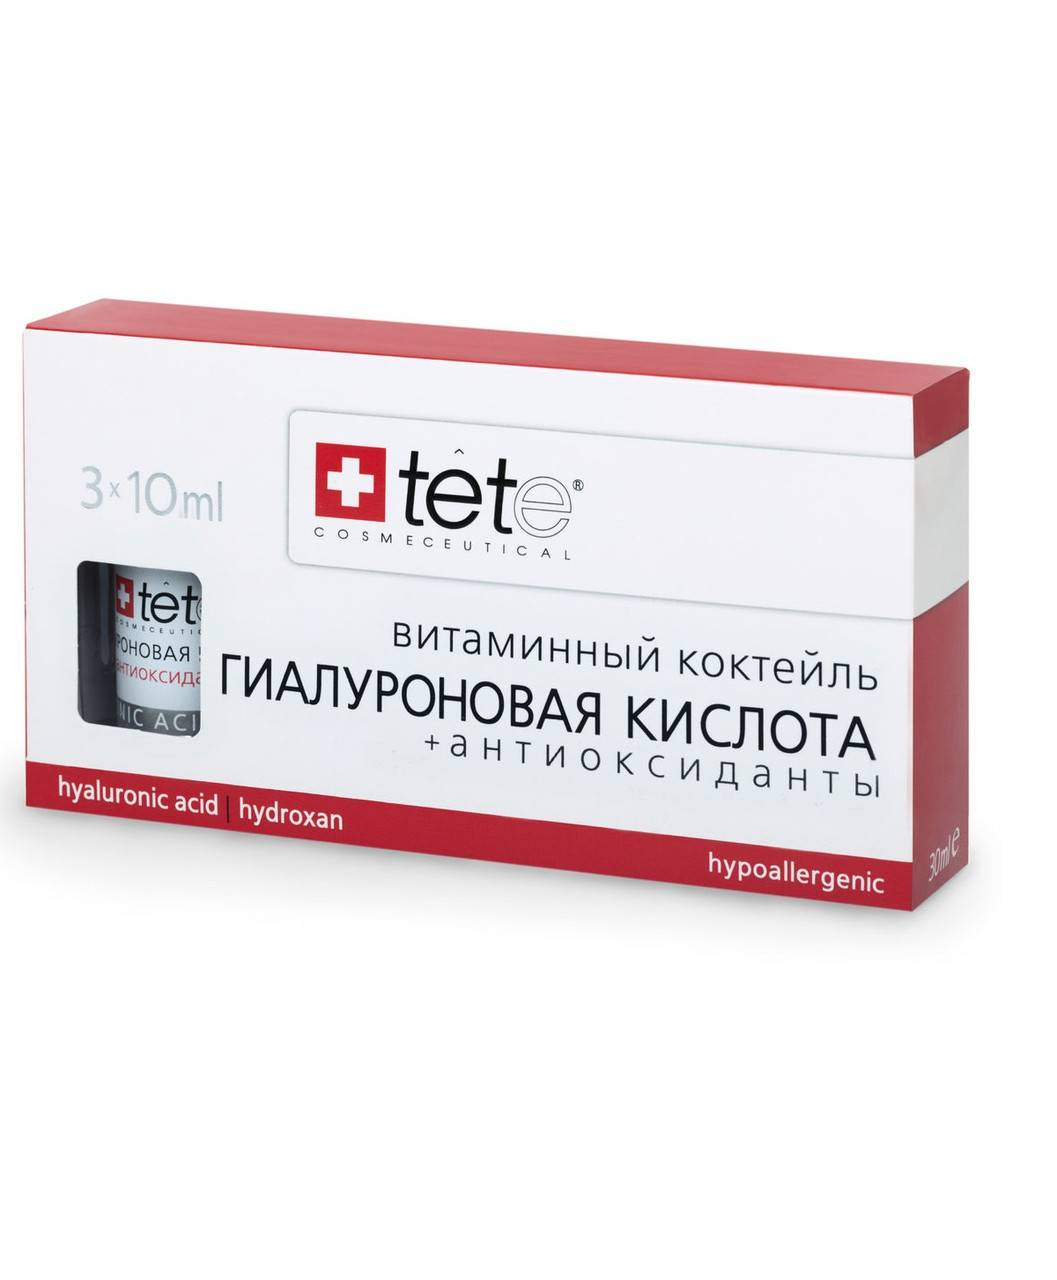 Косметика для мезороллера: гиалуроновая кислота, коллаген, витамины